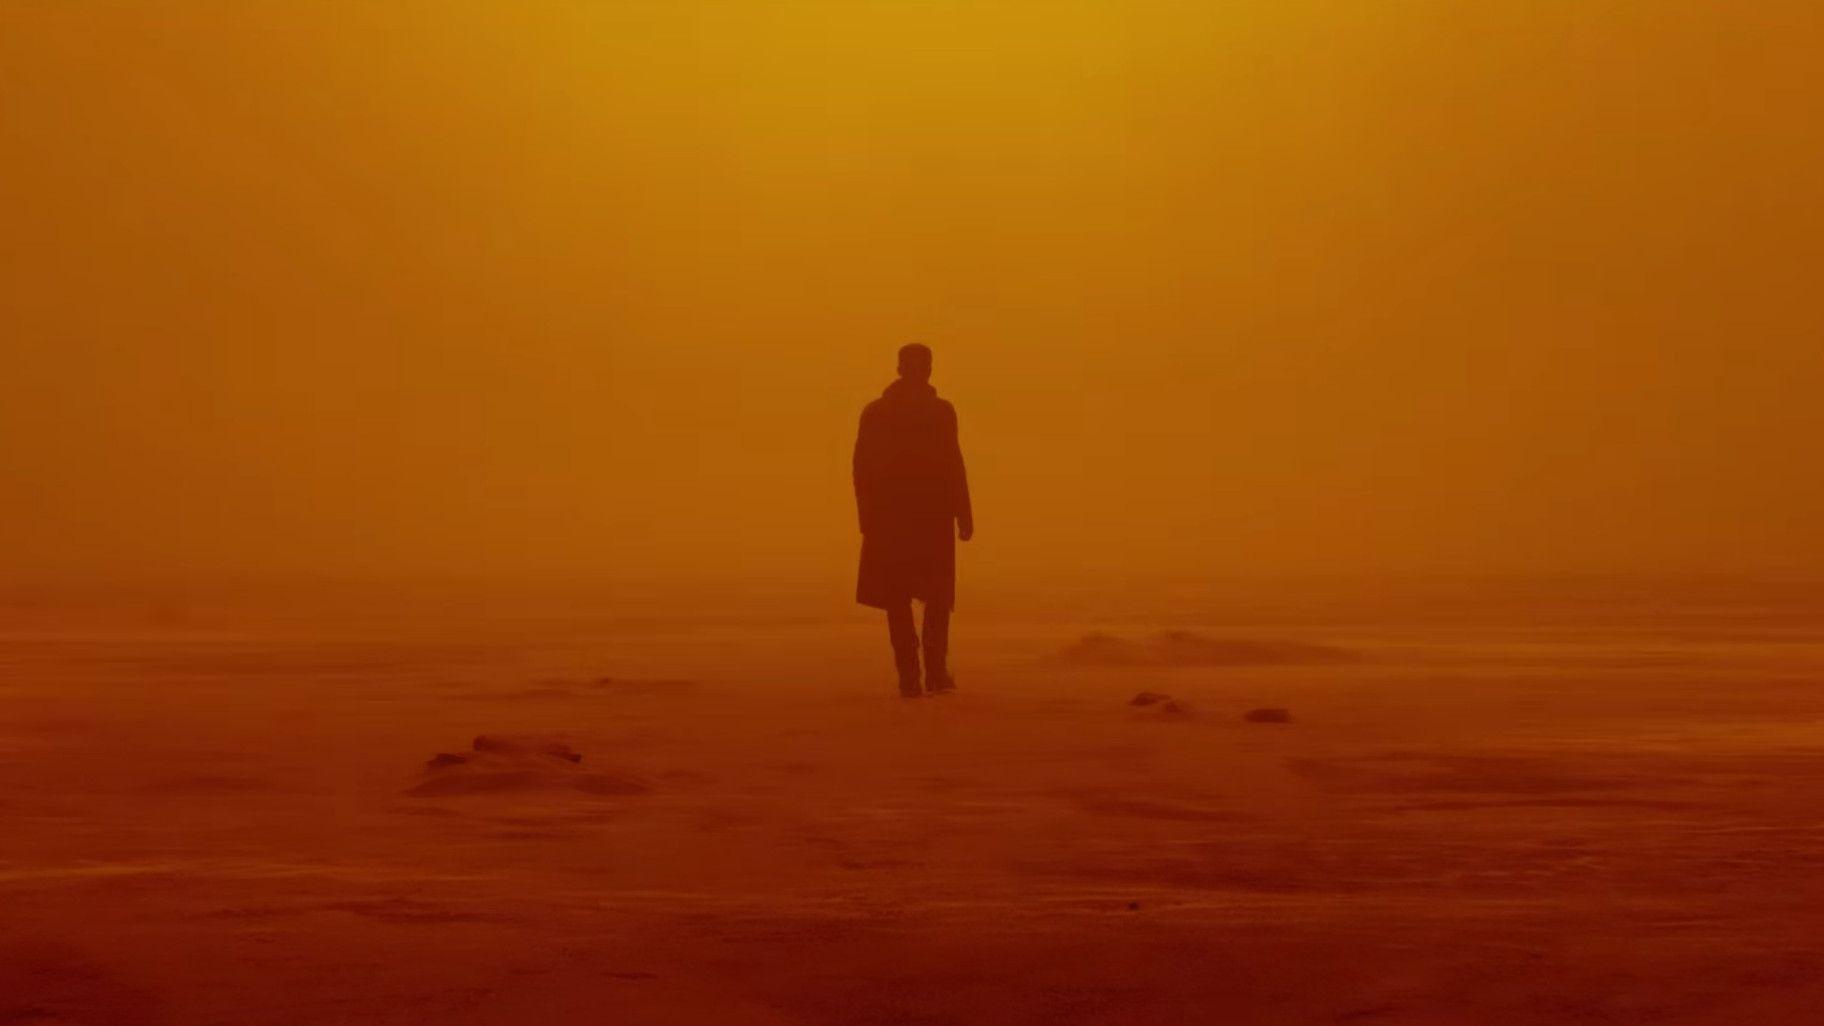 Fotogramma da Blade Runner 2049 - Villeneuve